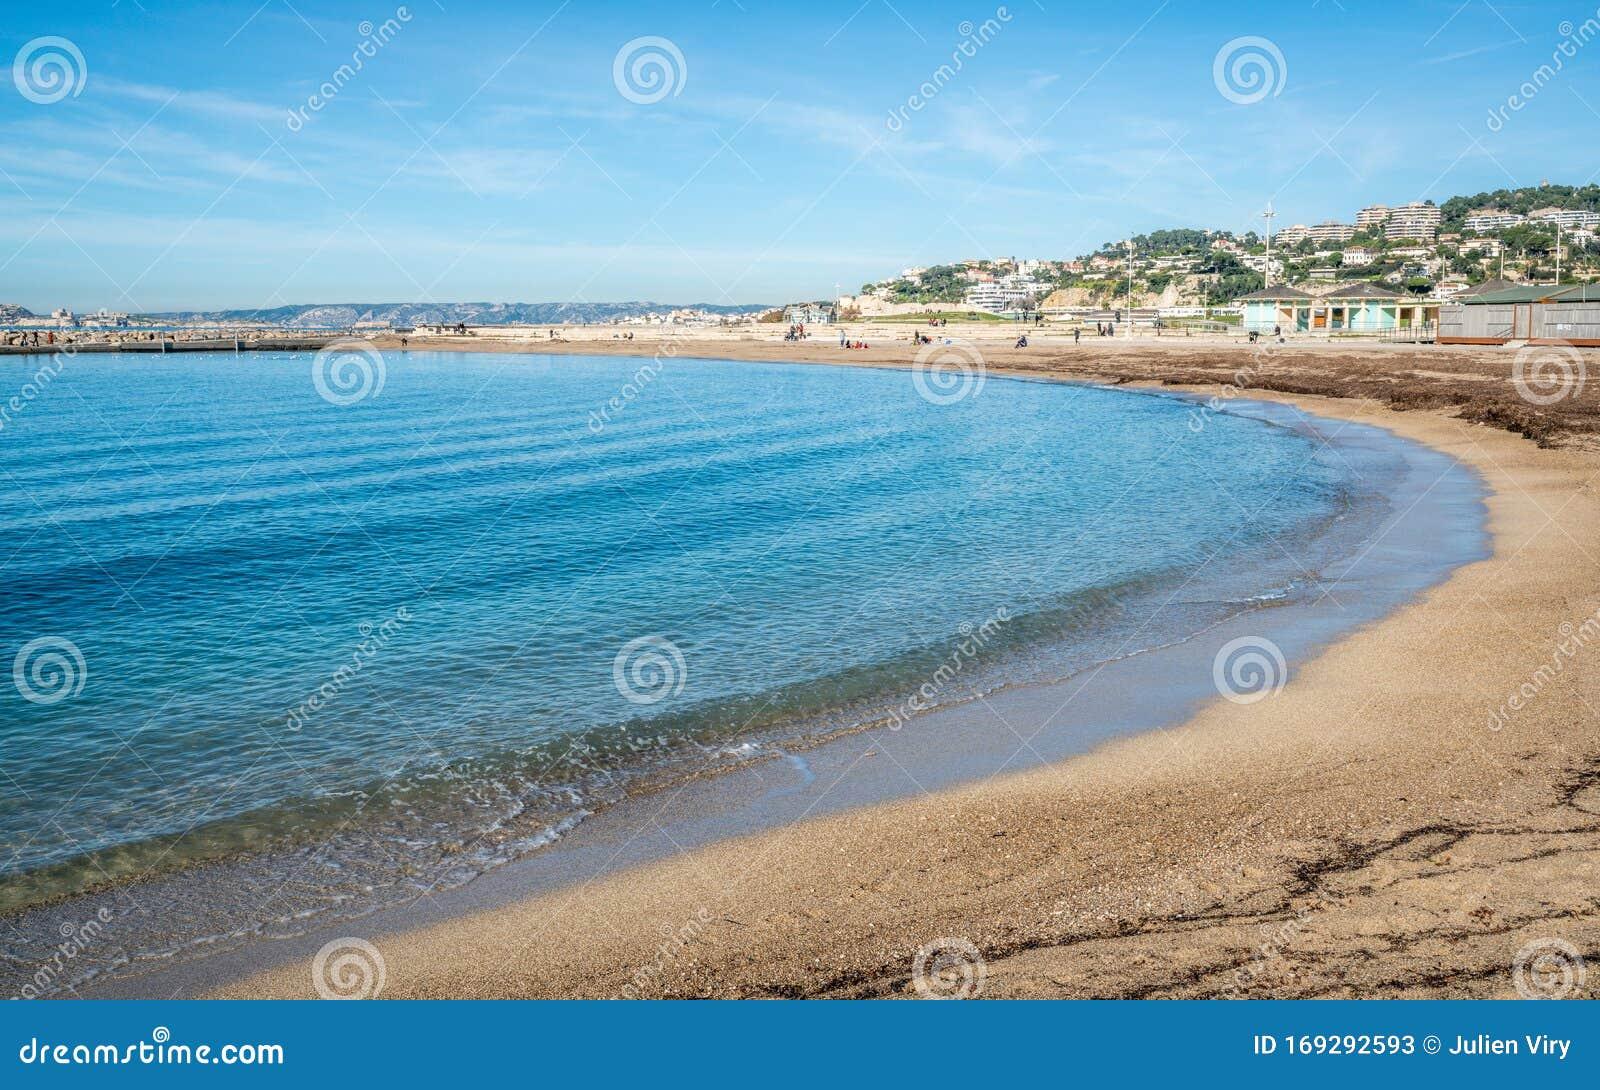 Scenic View Of Prado Beach On Beautiful Sunny Day Marseille France